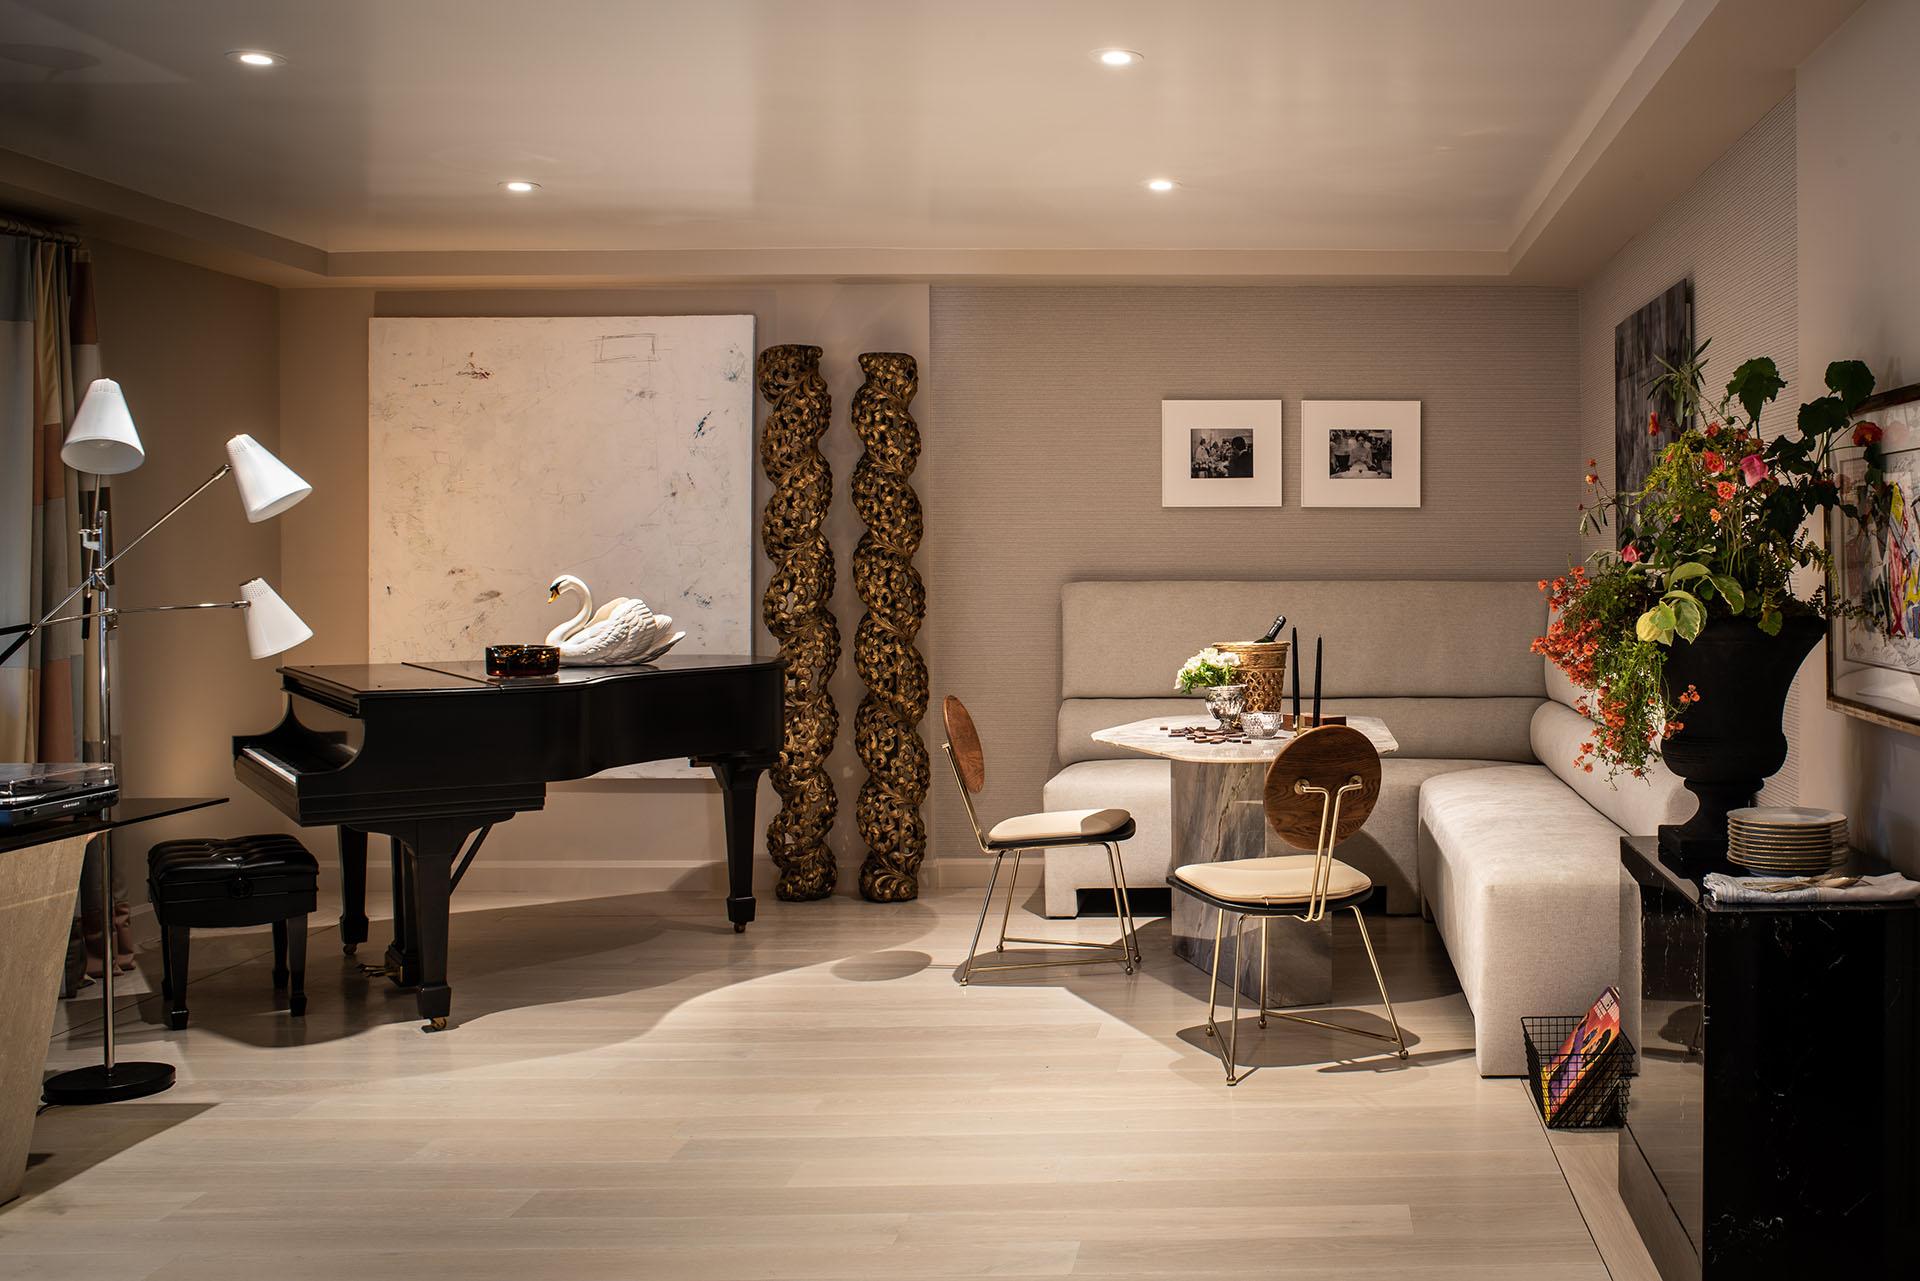 BelewArmour_Lounge1_Room#38_SFShowcase19_LowRes.jpg